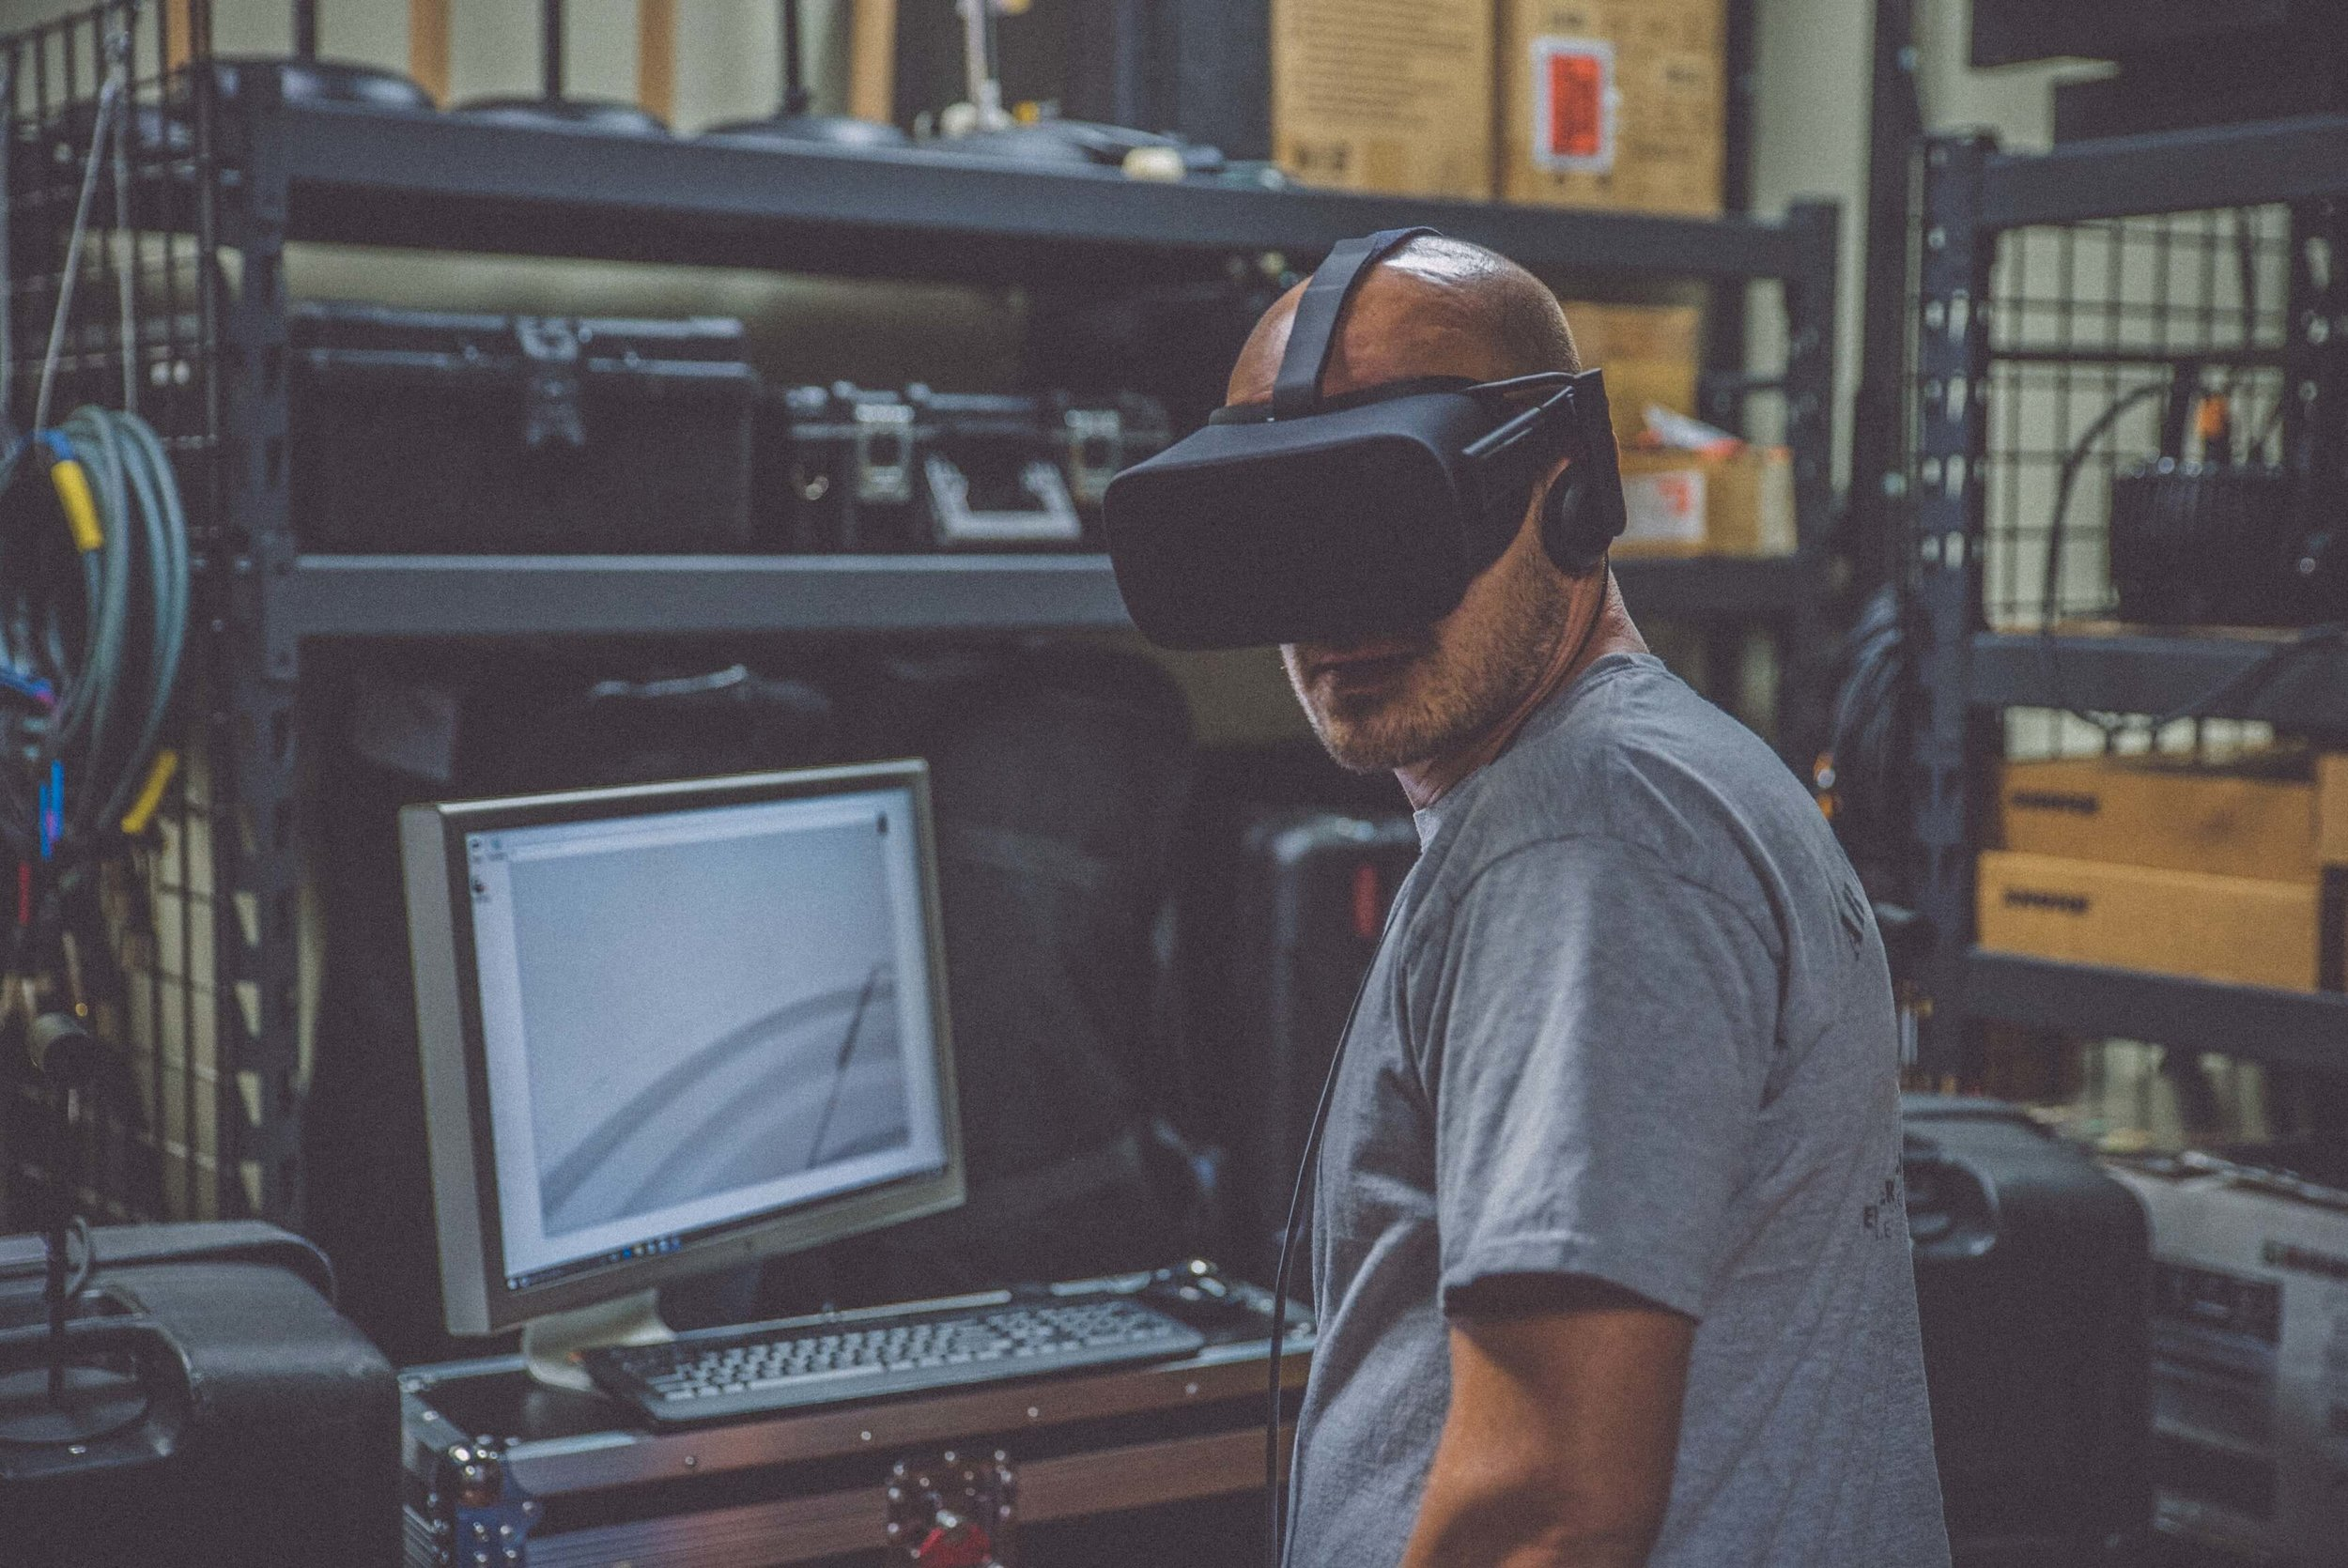 Virtual Reality training and education